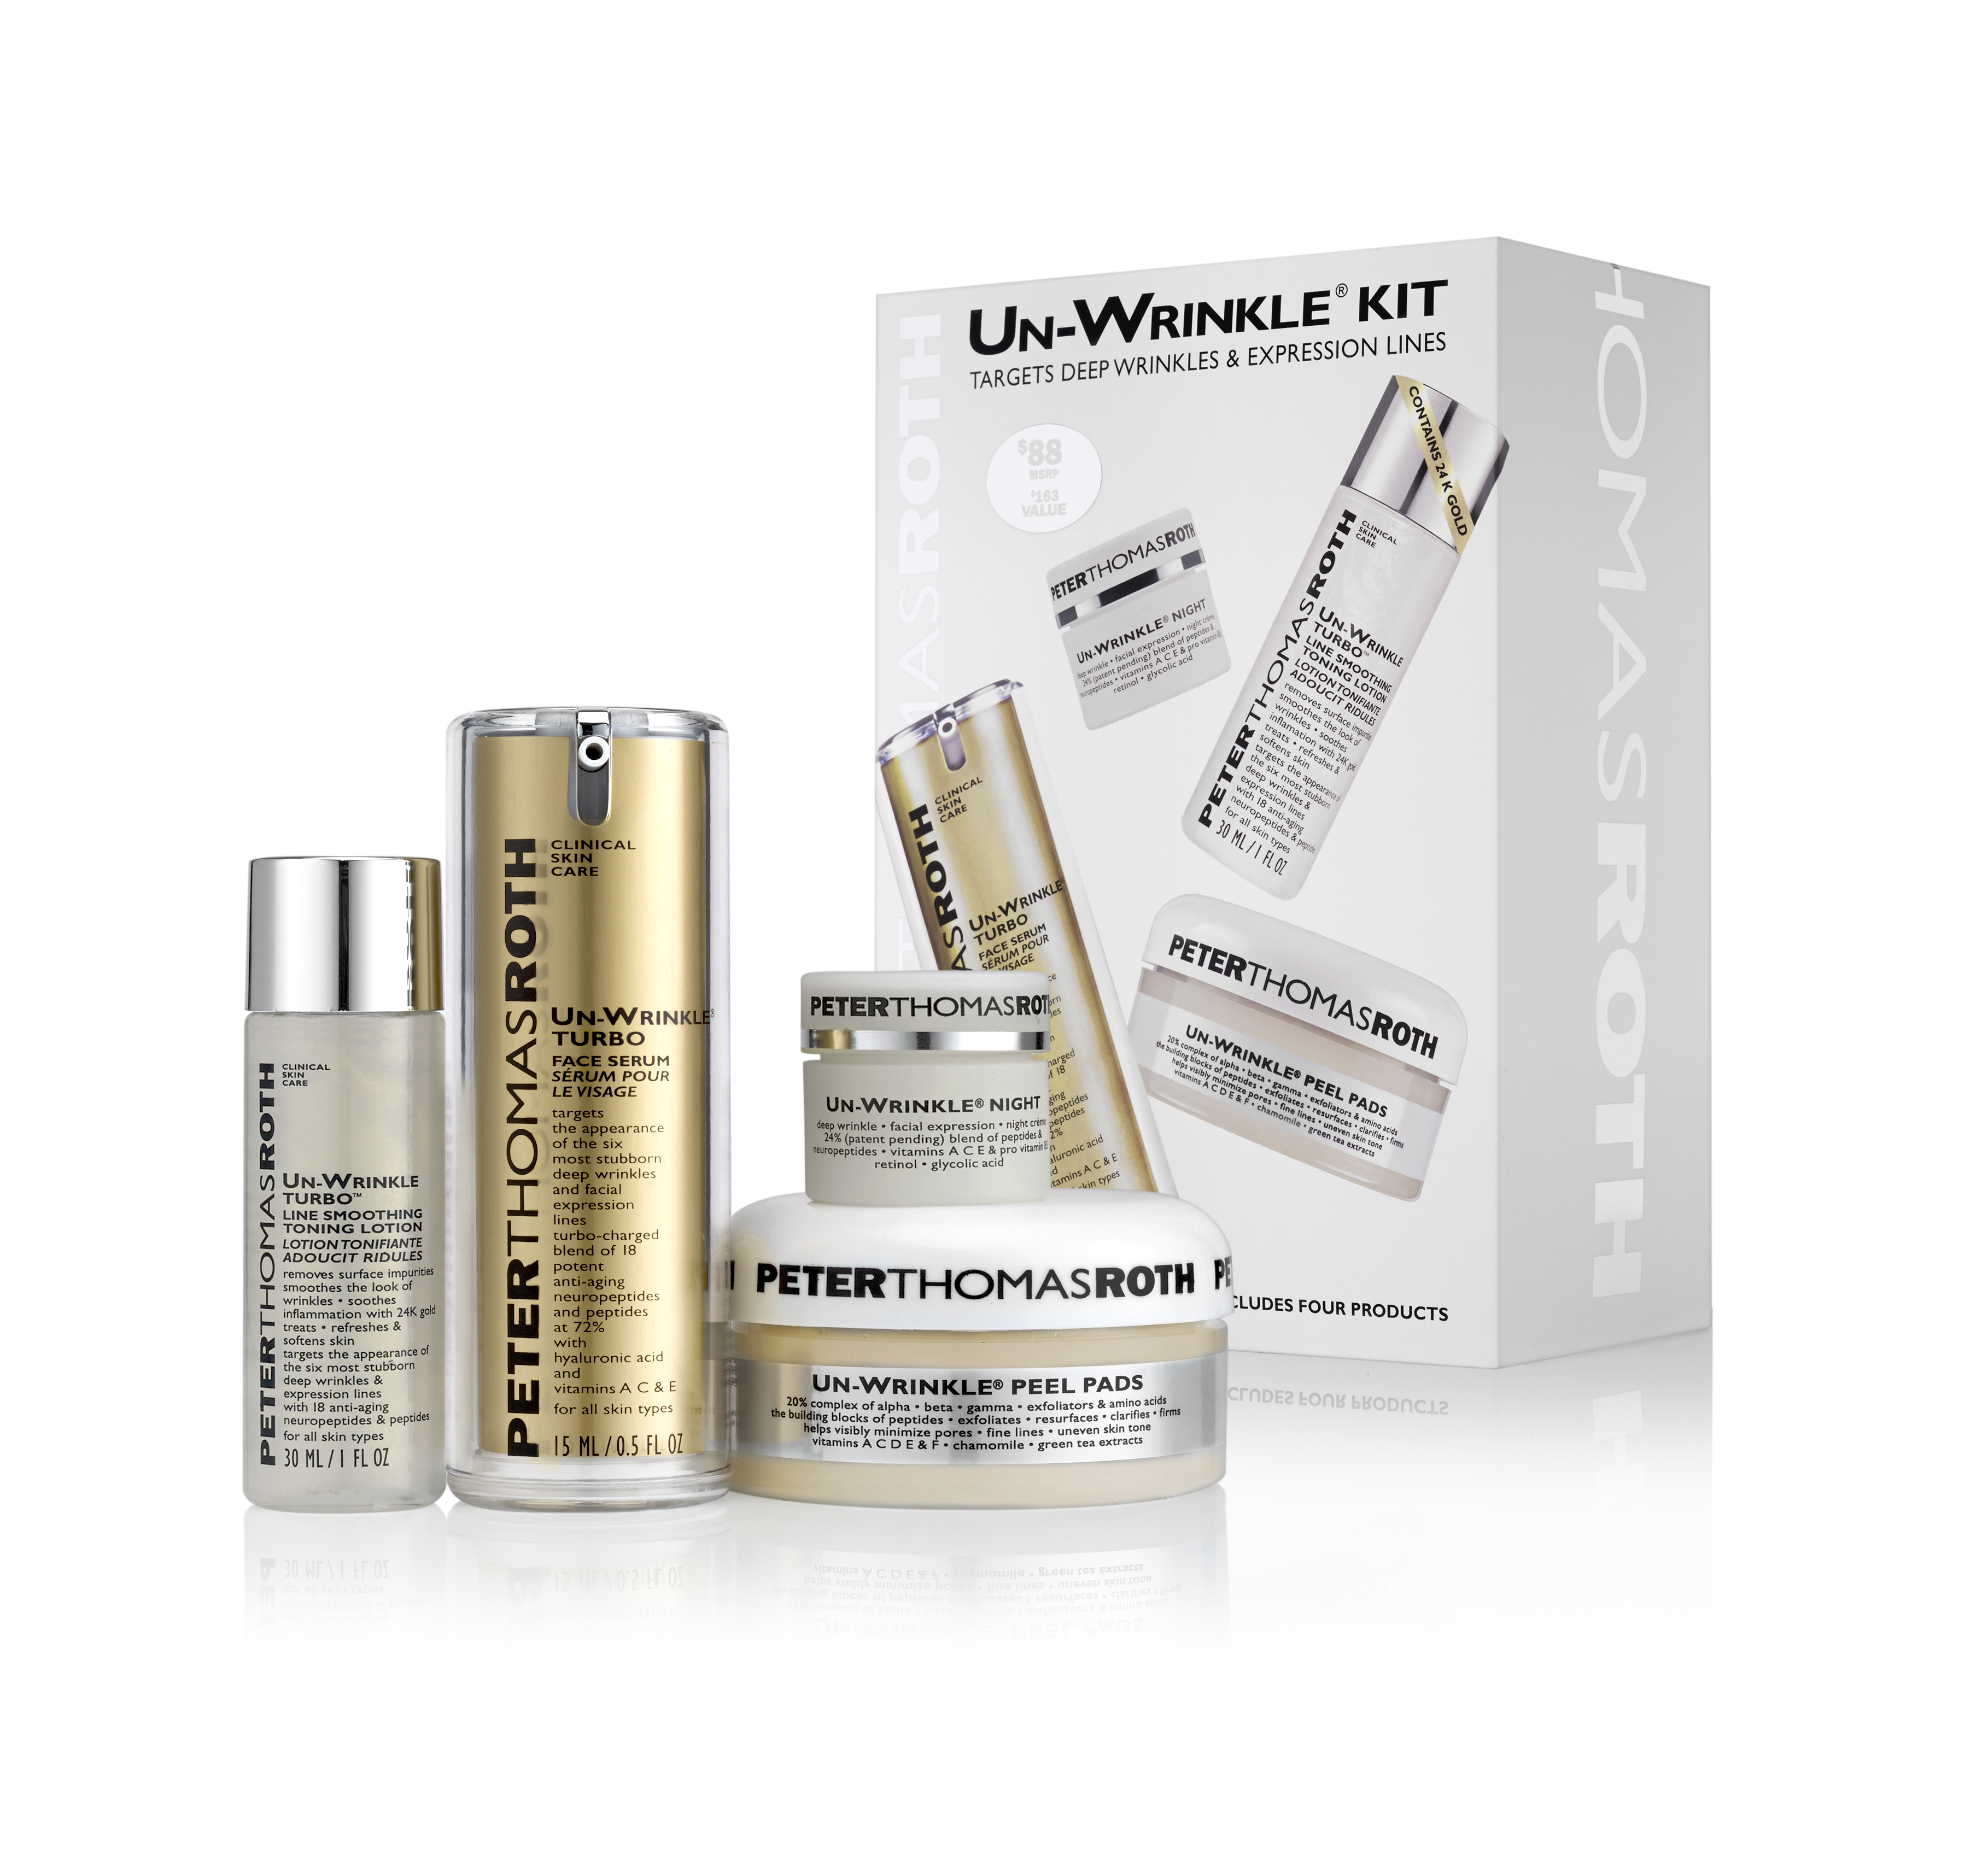 Un-Wrinkle Kit